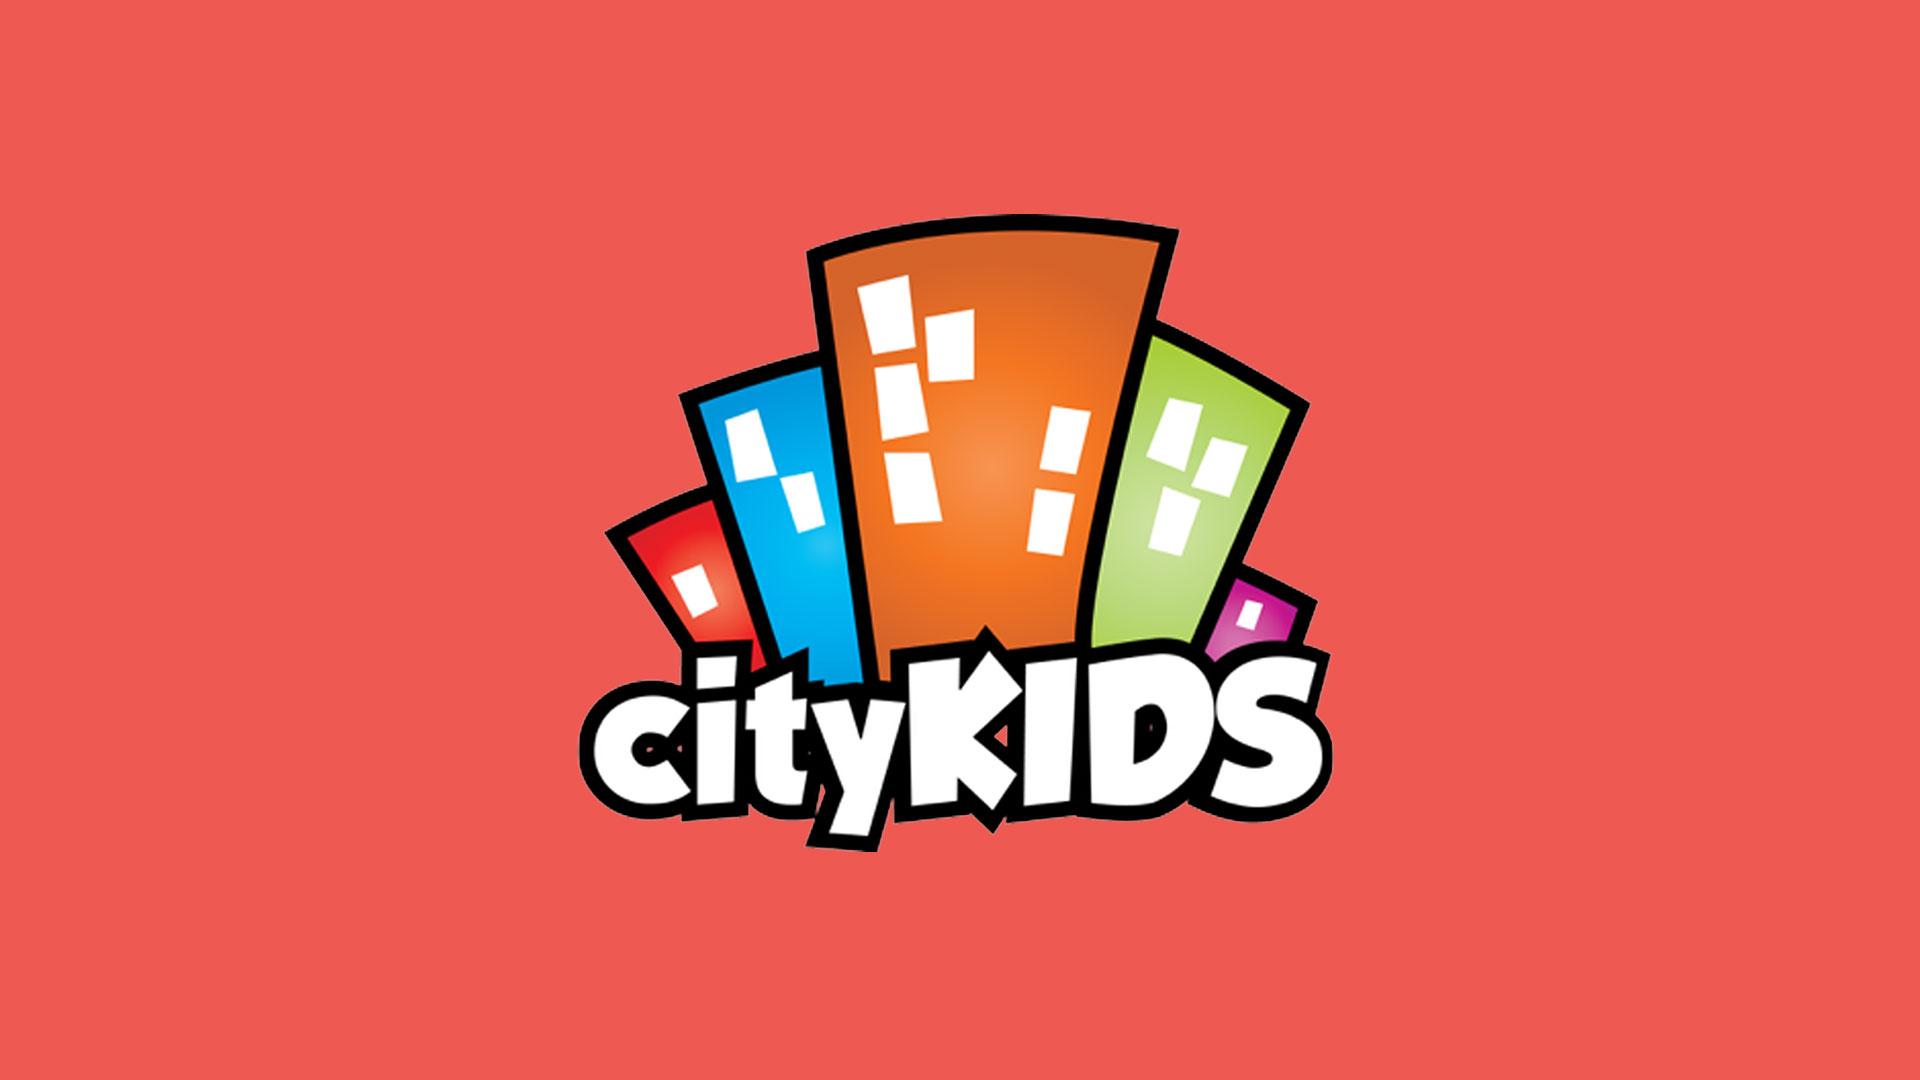 bethesda-city-kids-logo.jpg